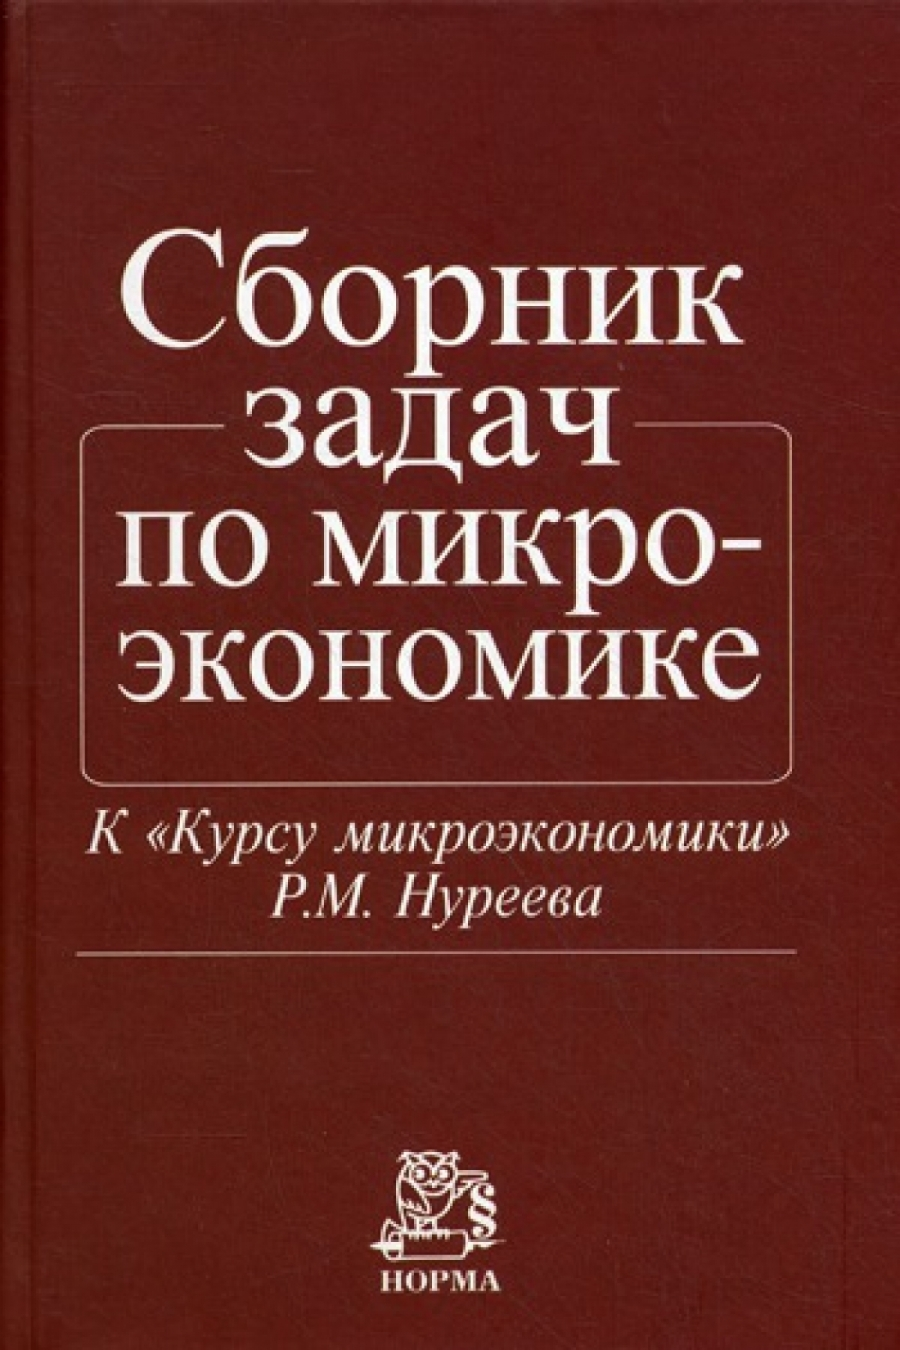 Обложка книги:  р.м. нуреев - сборник задач по микроэкономике к курсу микроэкономики р.м. нуреева